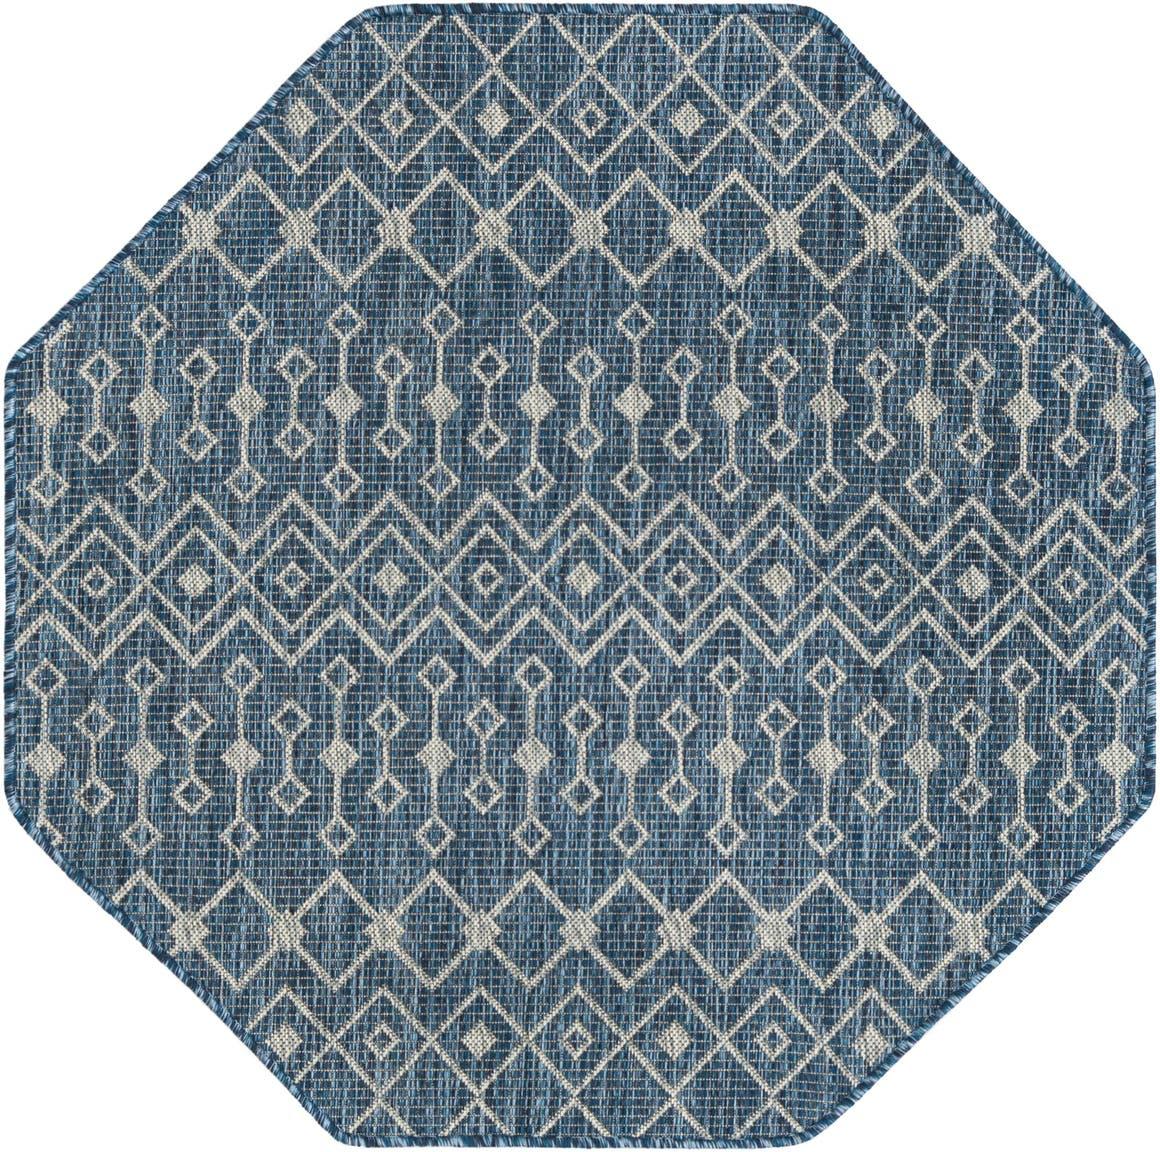 4' x 4' Outdoor Trellis Octagon Rug main image